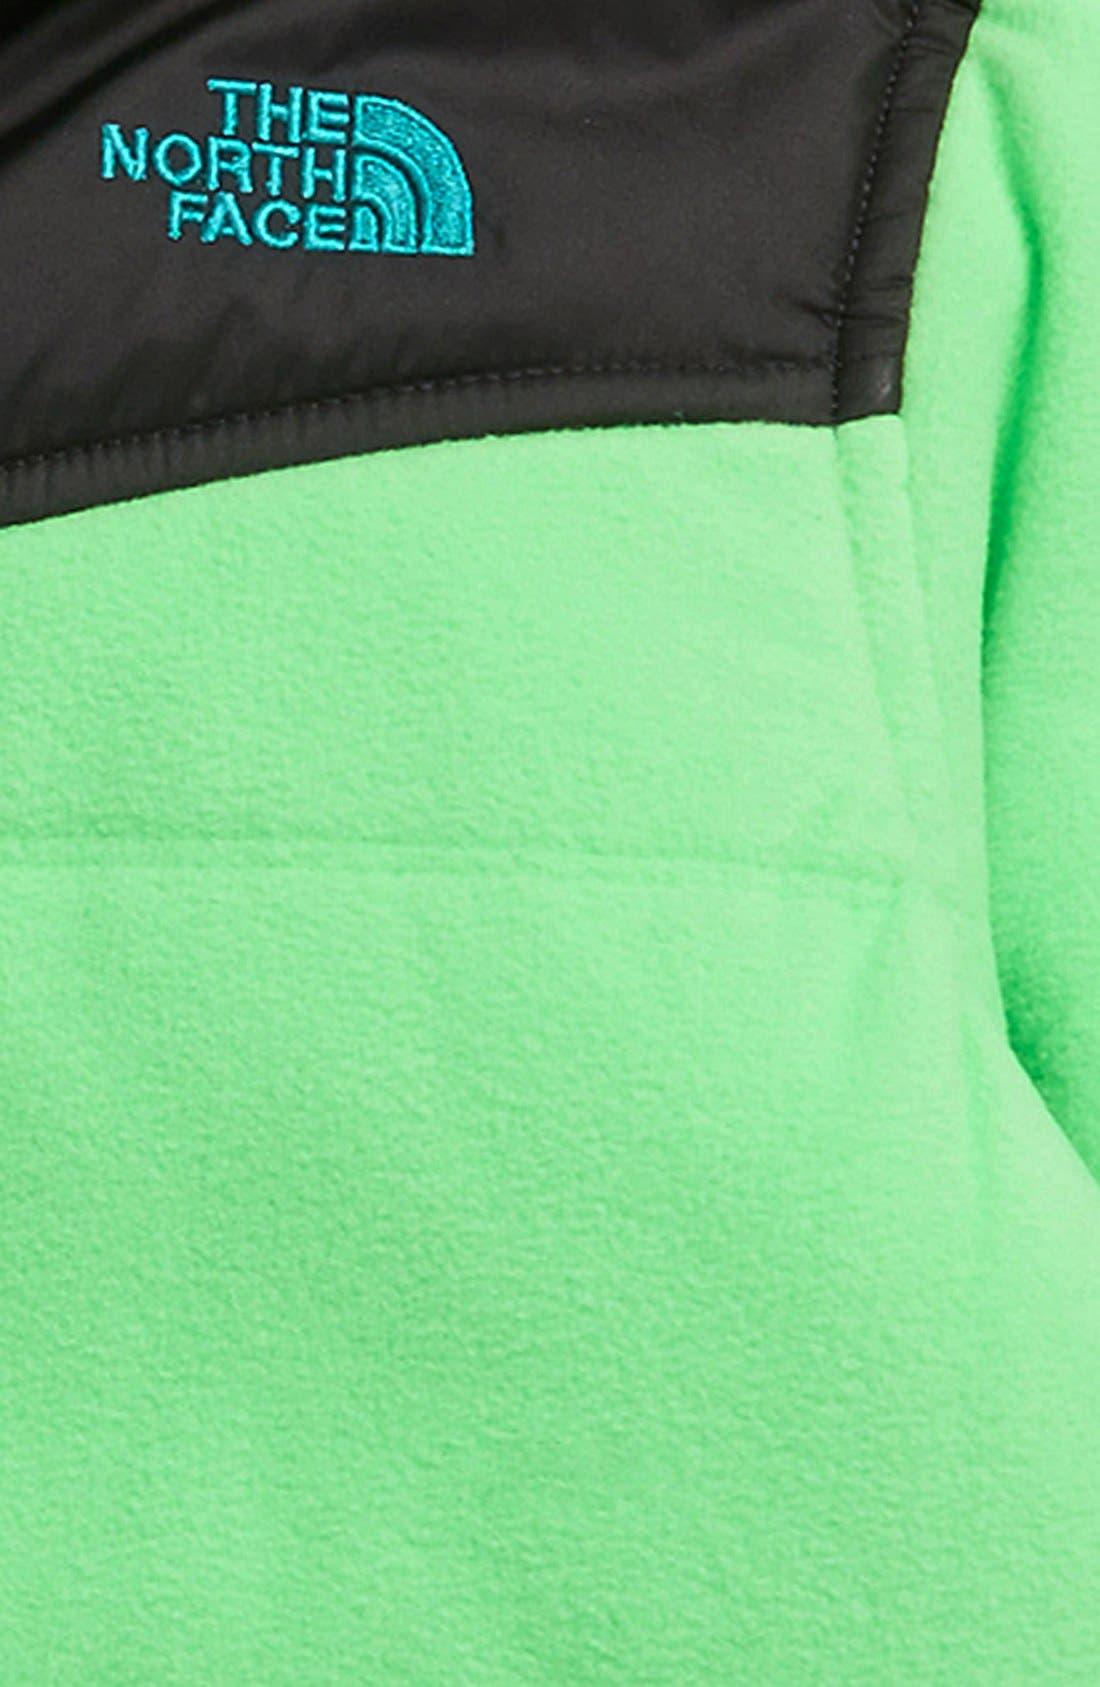 Alternate Image 3  - The North Face 'True or False' Reversible Water Resistant Jacket (Toddler Boys & Little Boys)